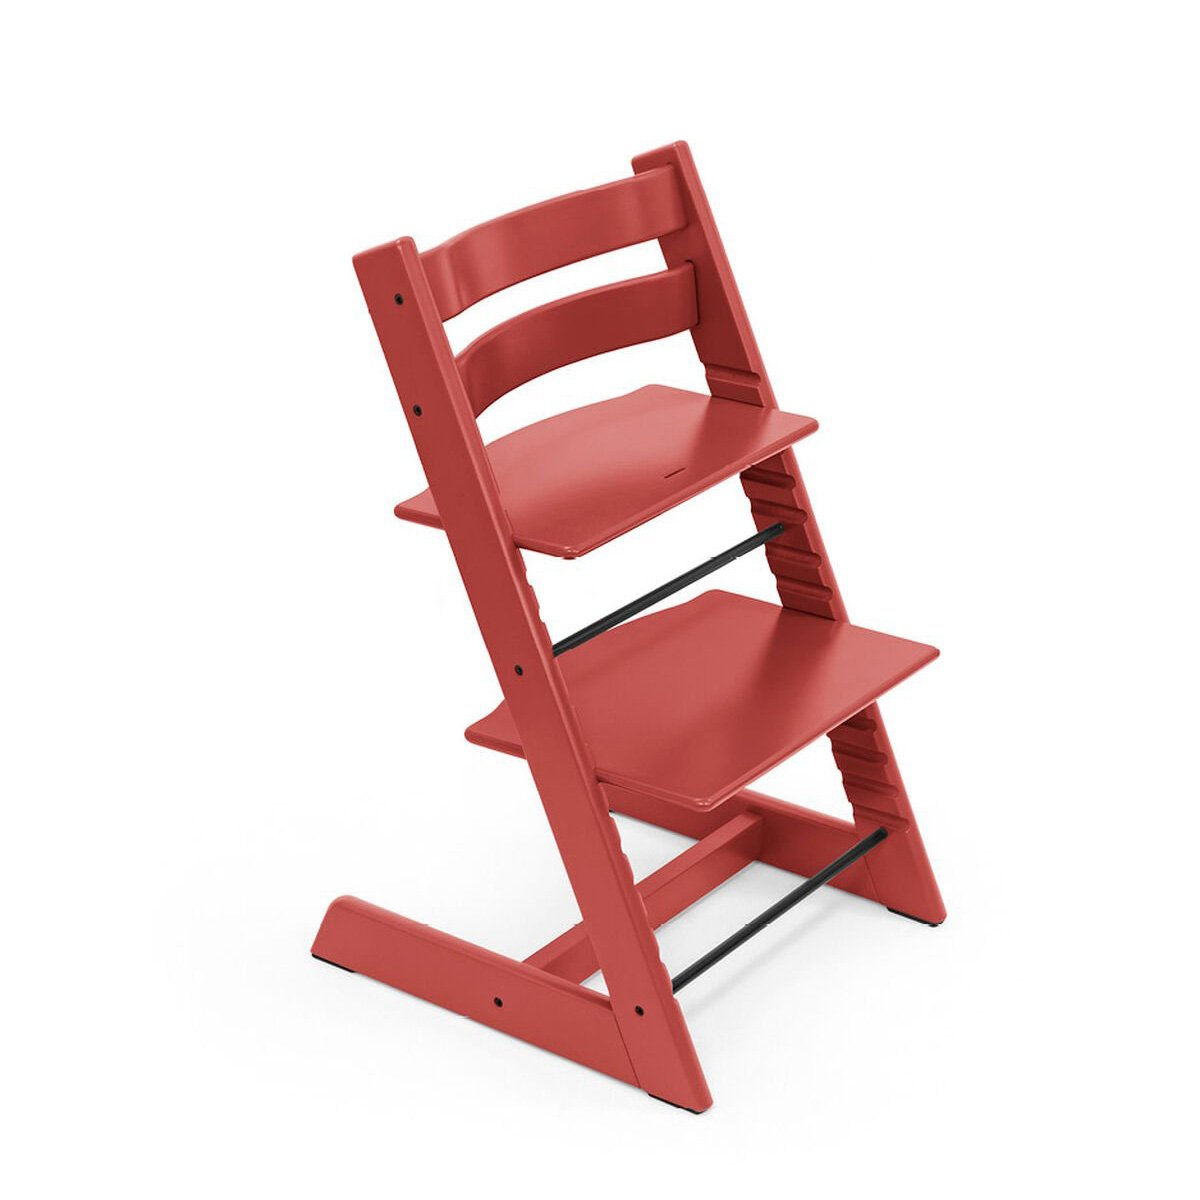 Chaise haute Tripp Trapp ROUGE Stokke